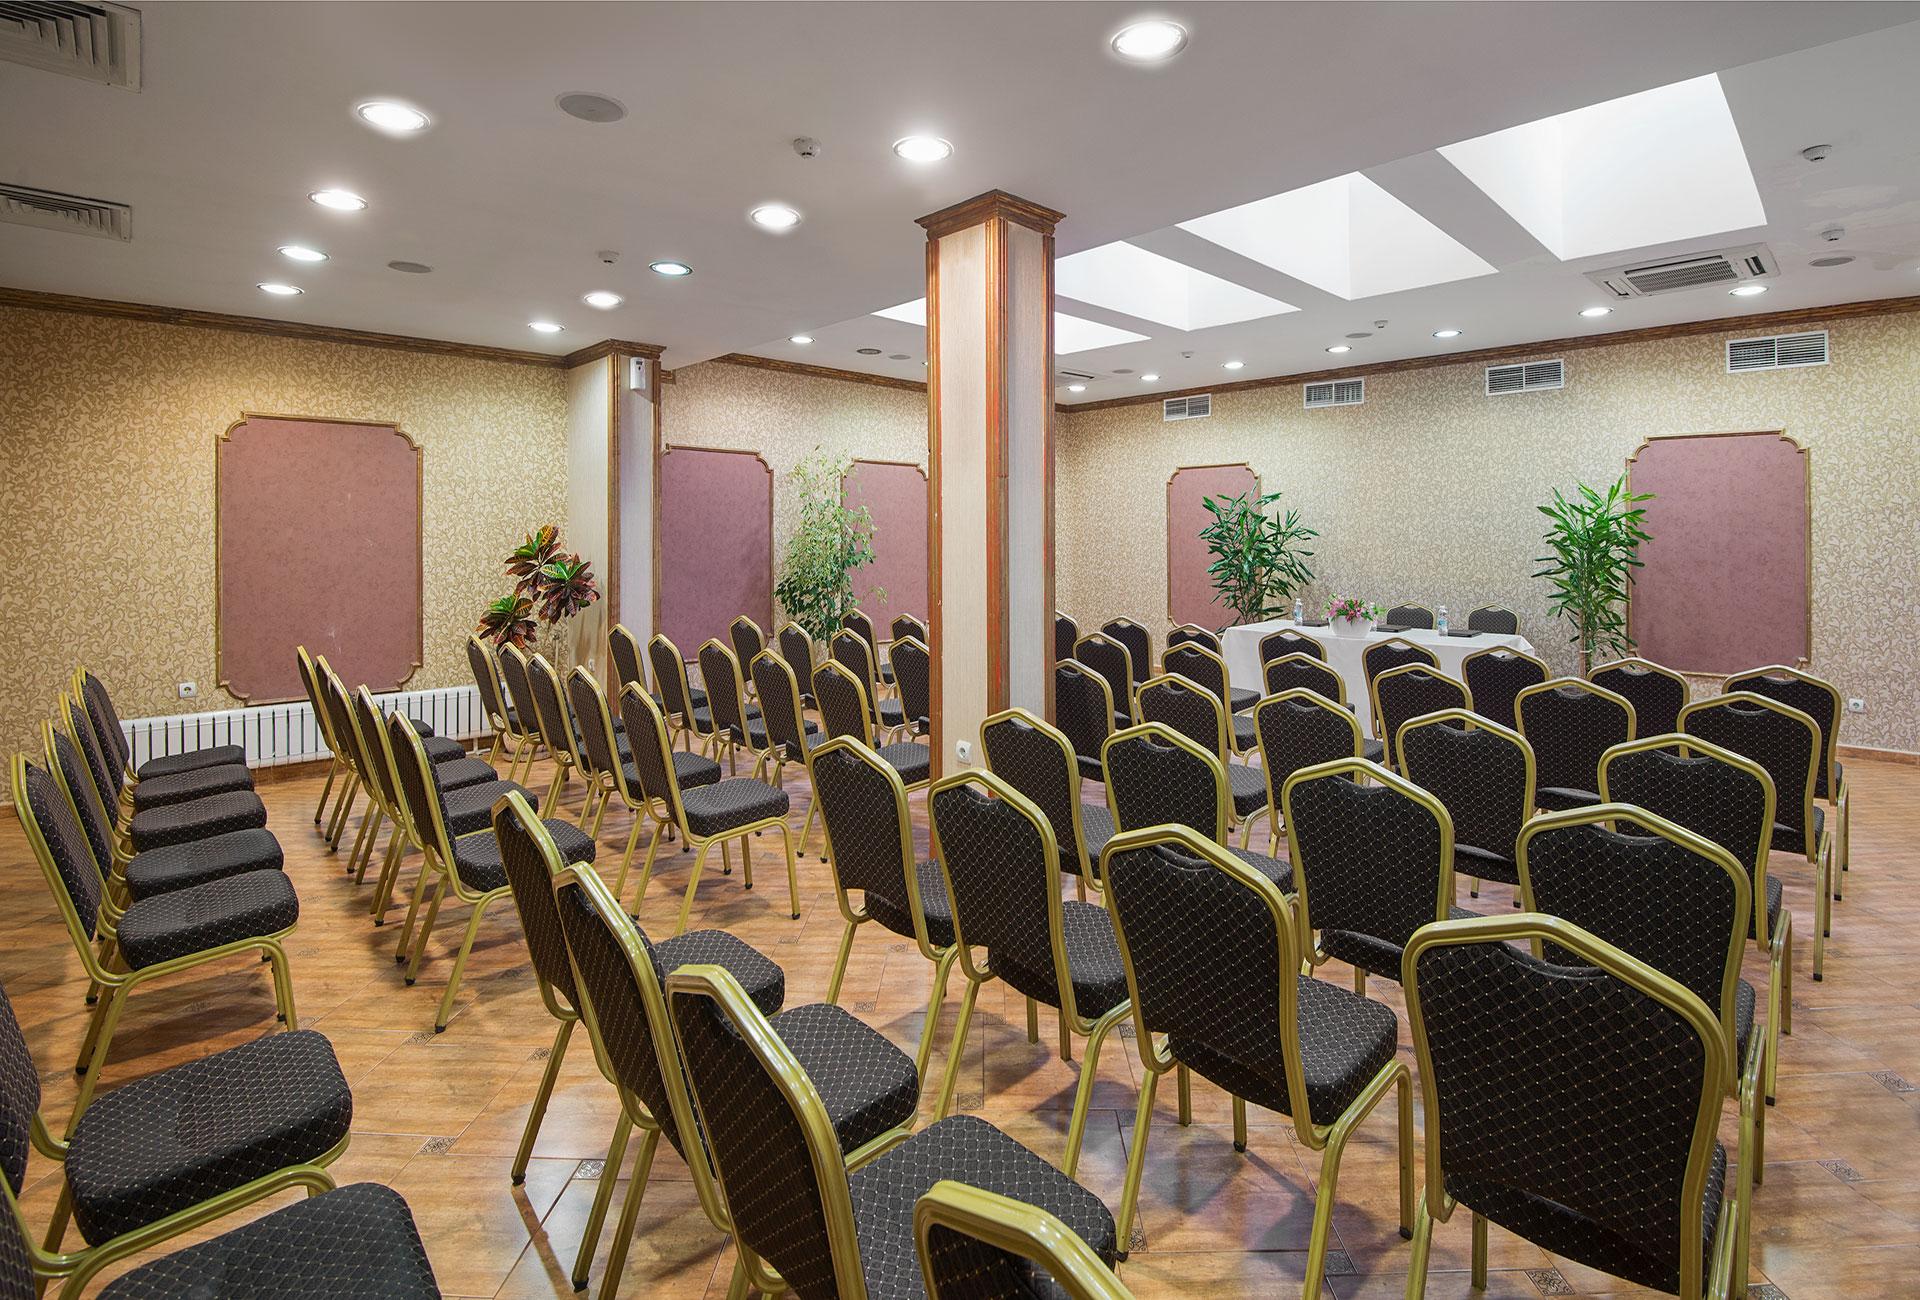 Конференции в хотел Спа Клуб Бор Велинград